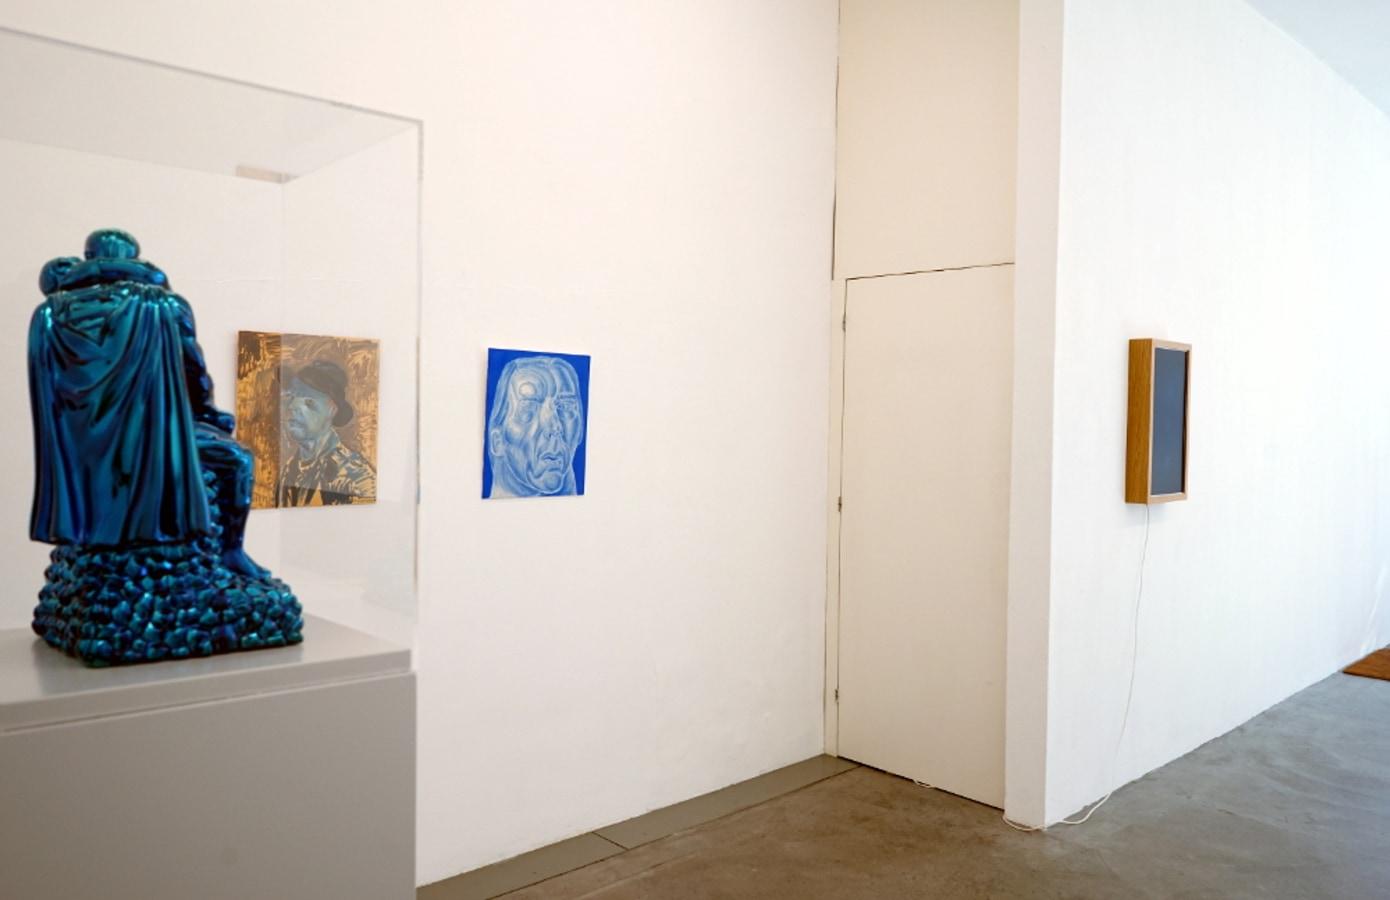 Into The Wild Blue Yonder, Philip Akkerman, Casper Braat, Popel Coumou,